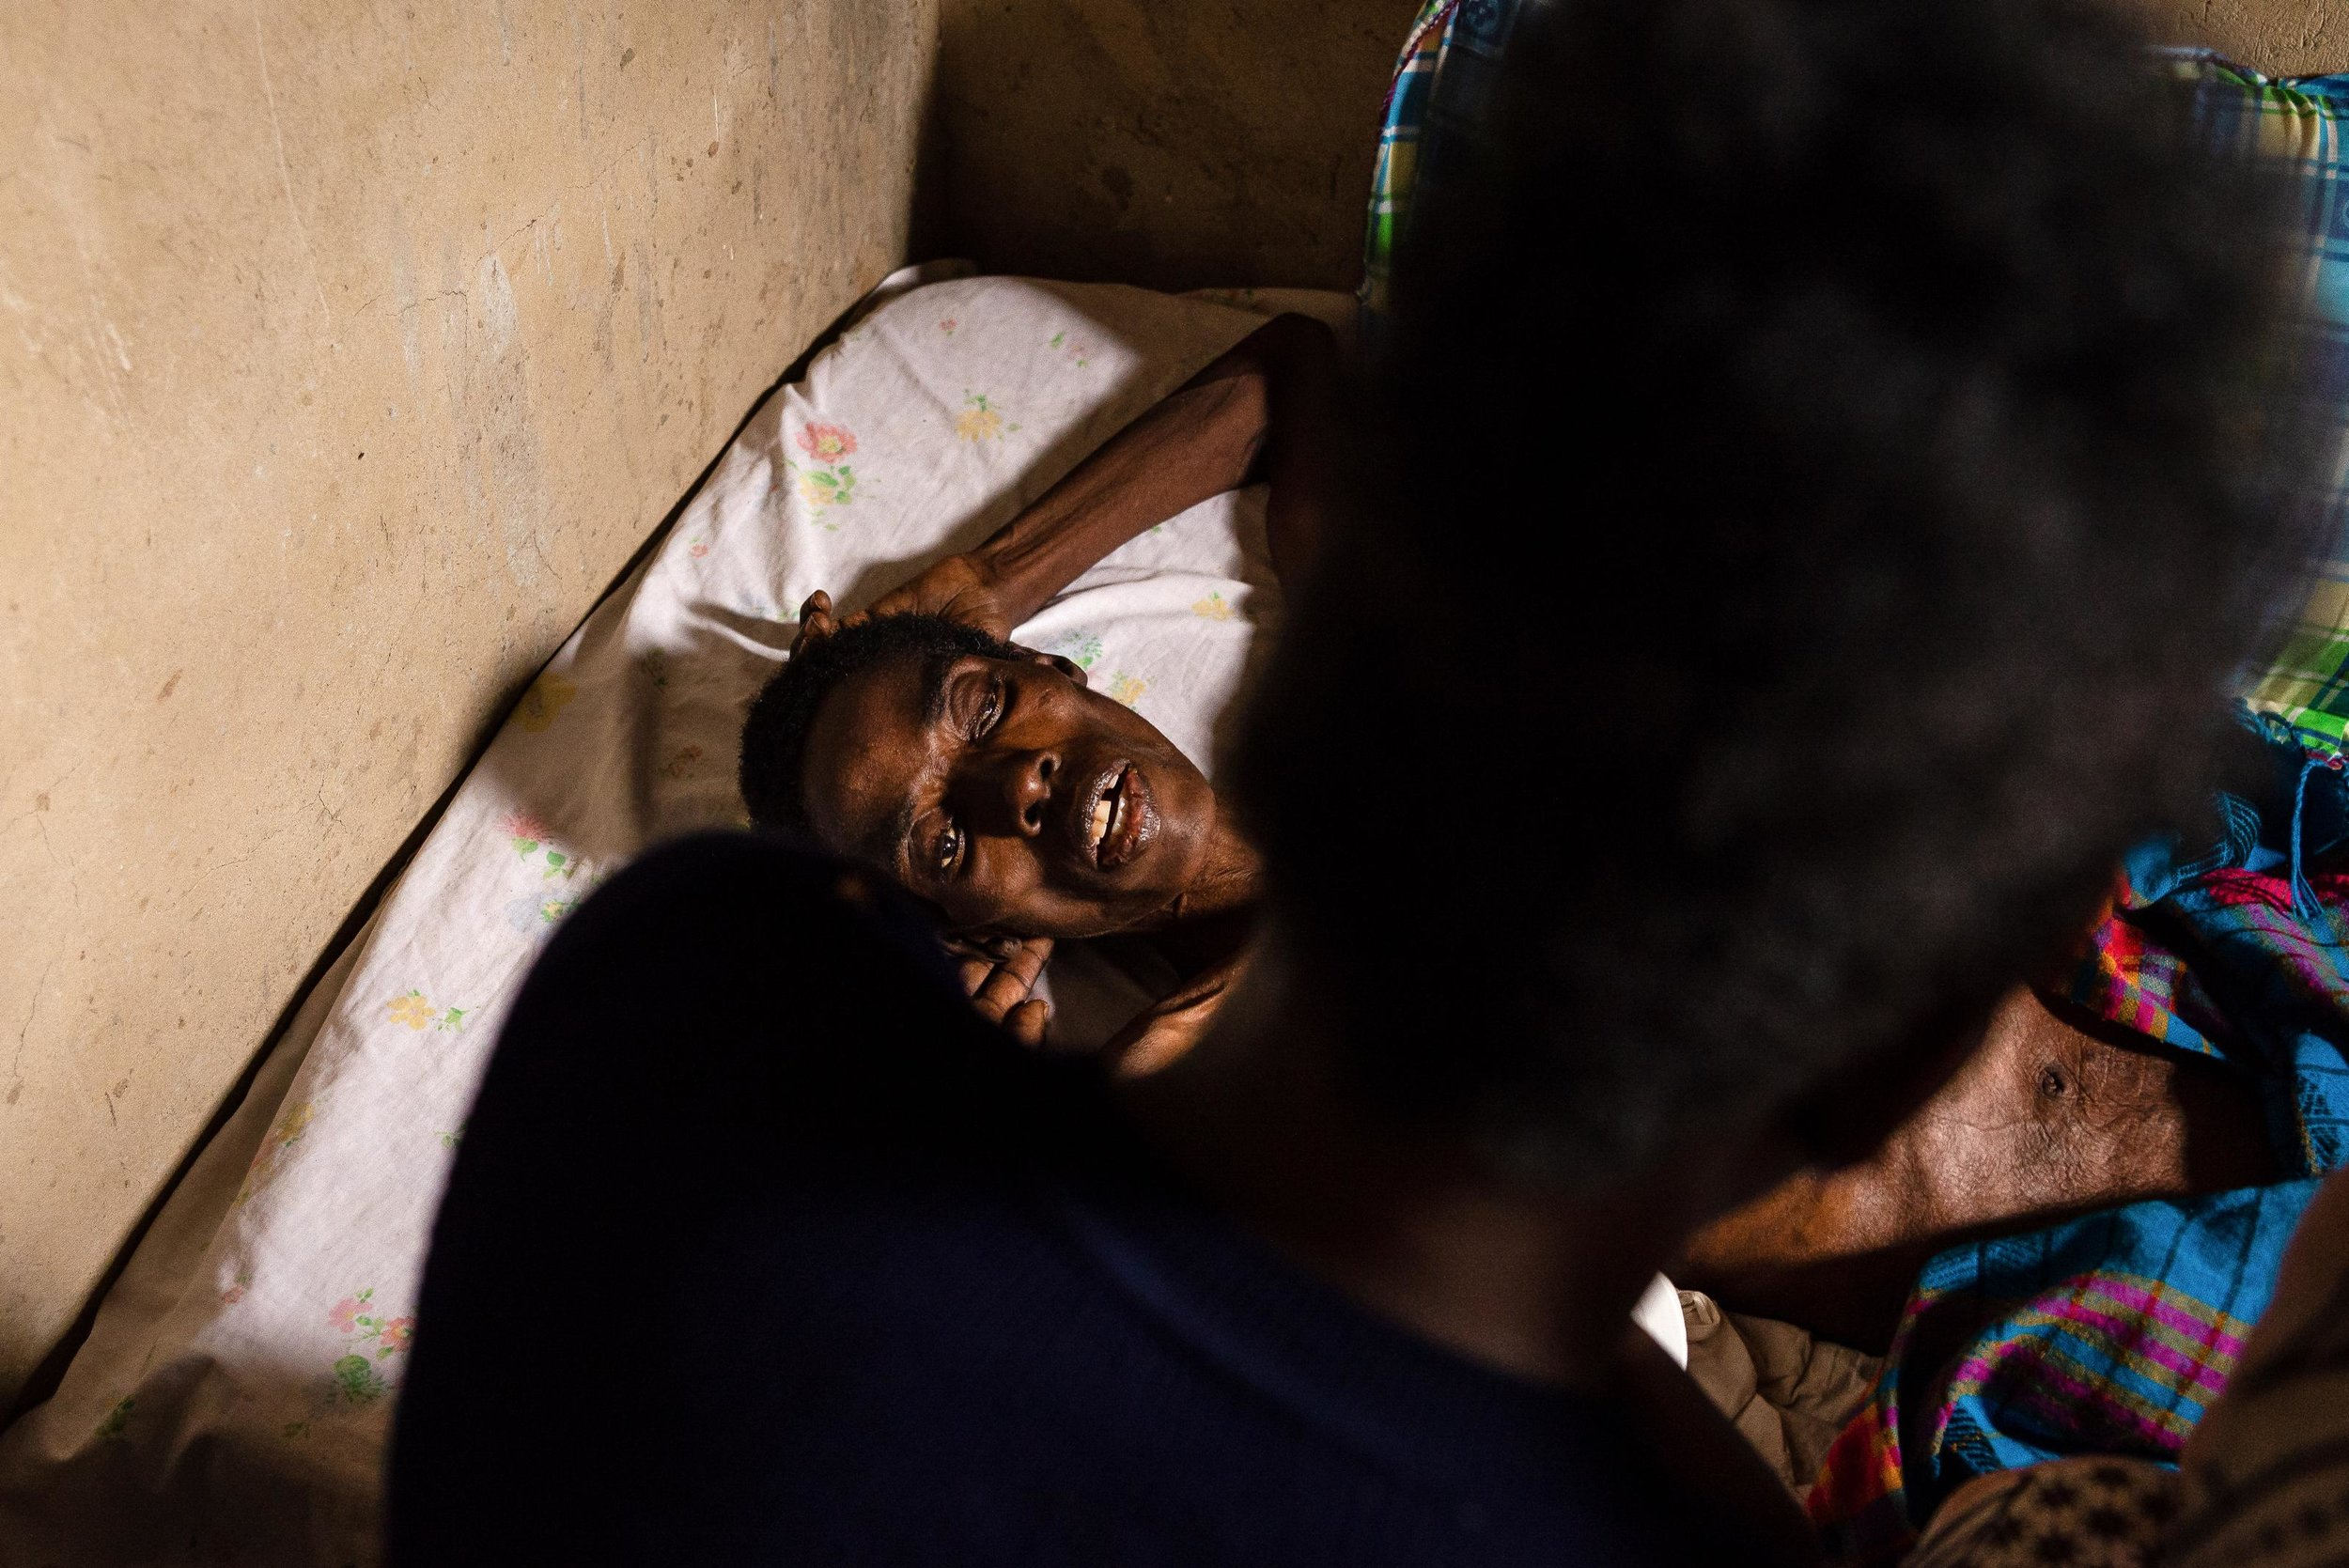 hospice-hiv-uganda-patient-nurse.jpg